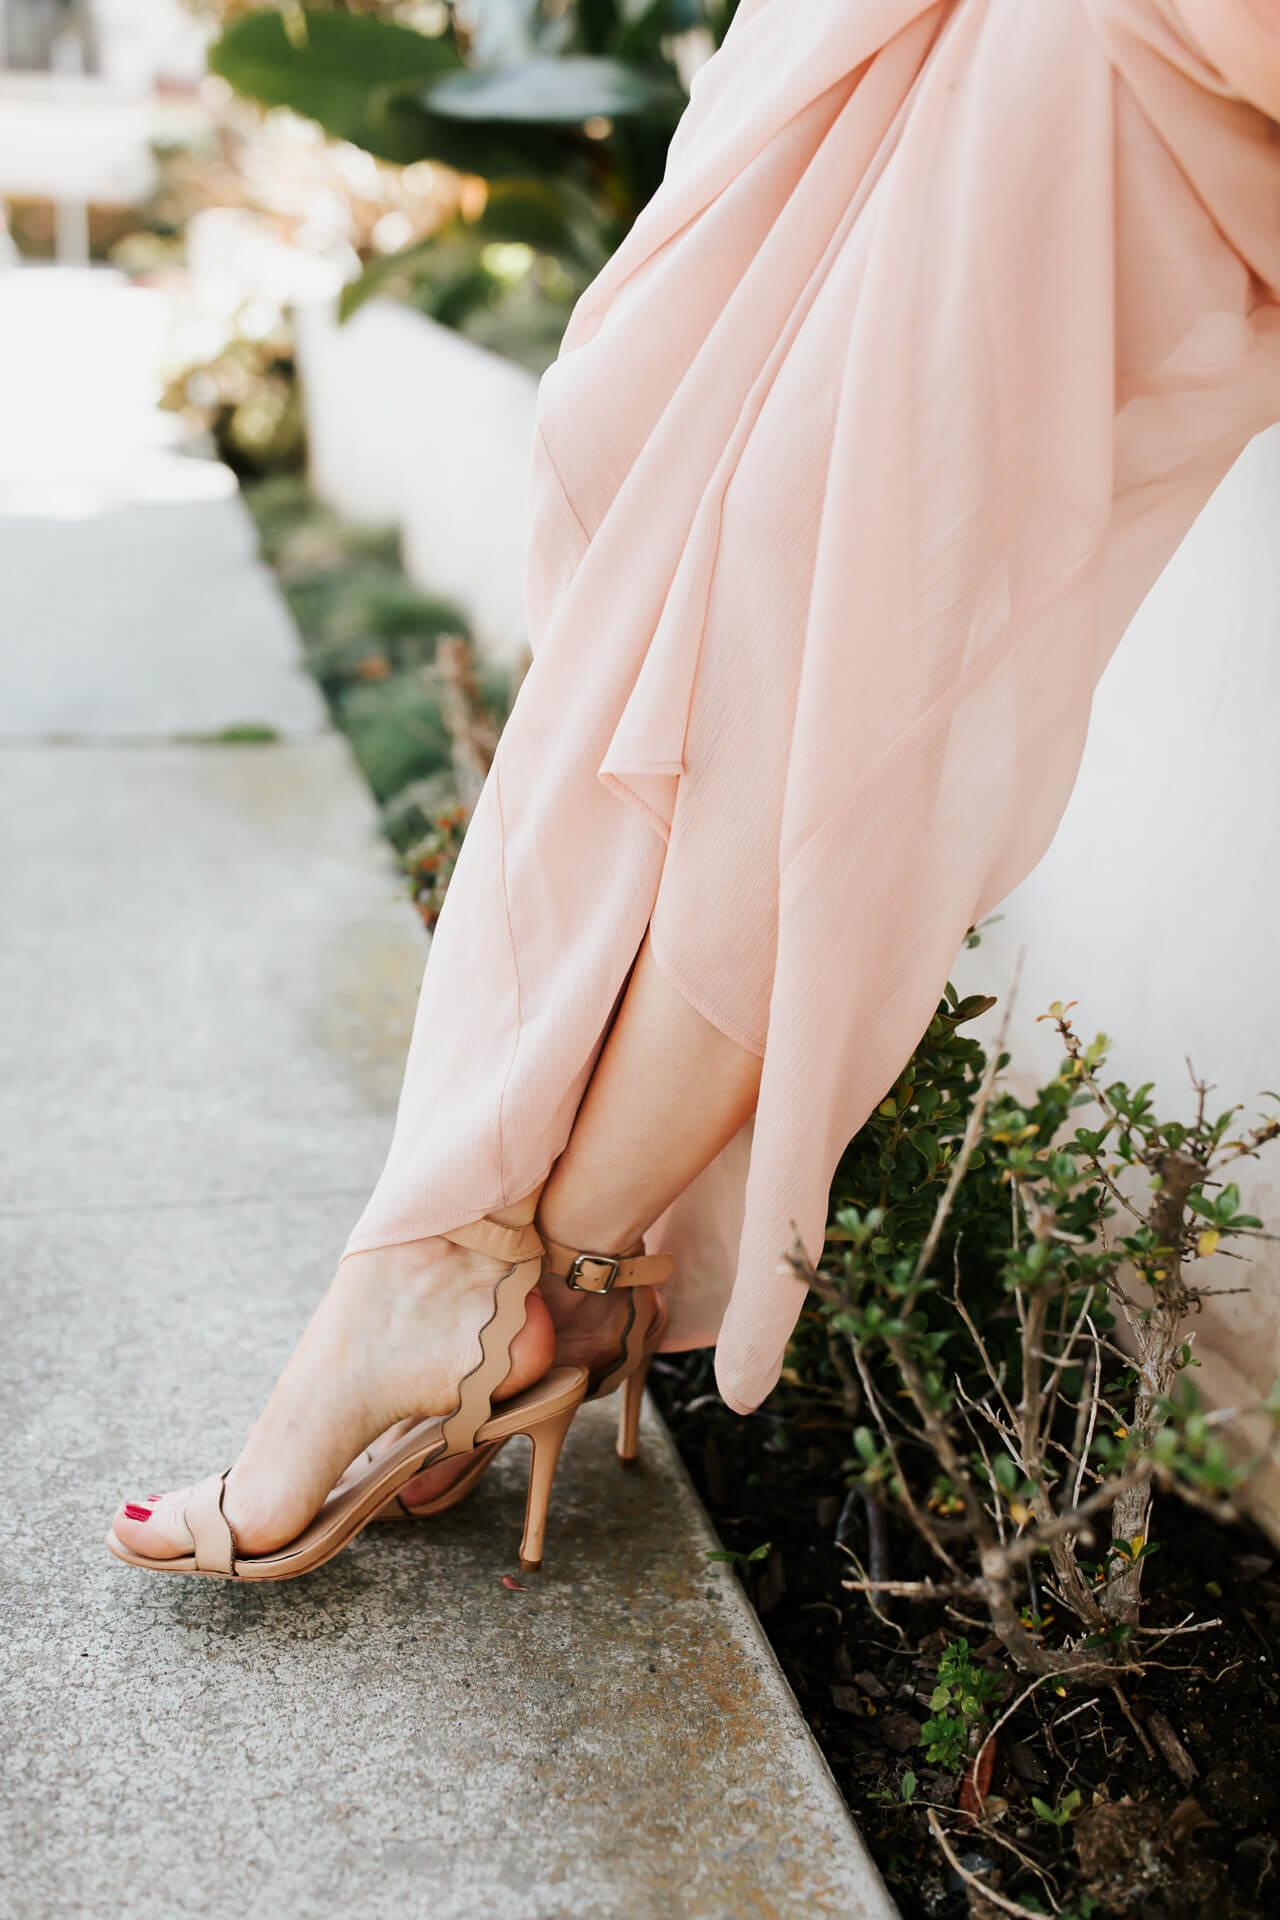 nude scalloped heels from loeffler randall